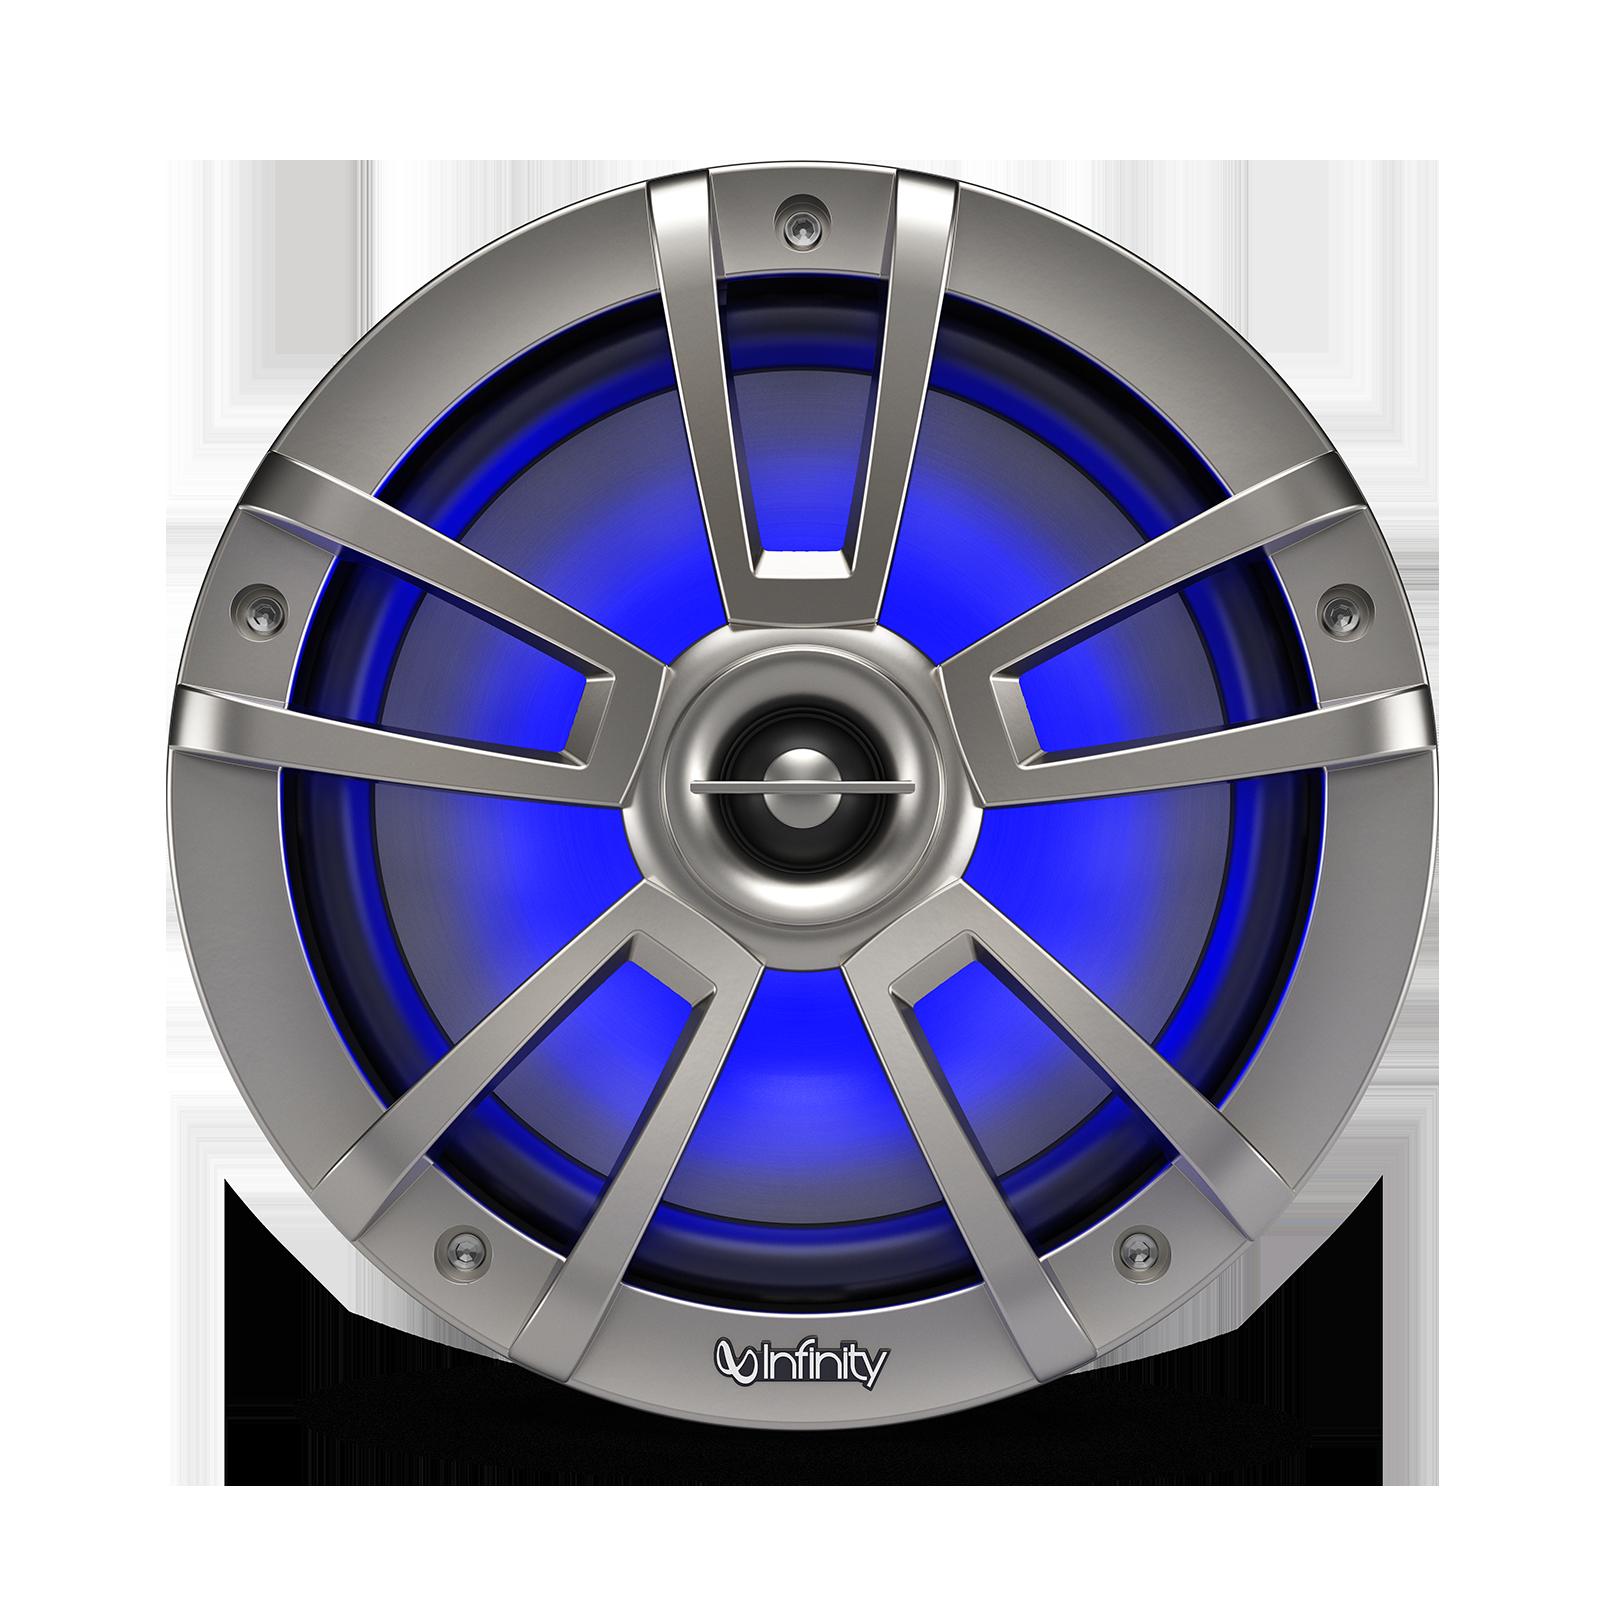 "Reference 822MLT - Graphite - Reference 822MLT—8"" (200mm) two-way marine audio multi-element speaker – titanium - Detailshot 3"